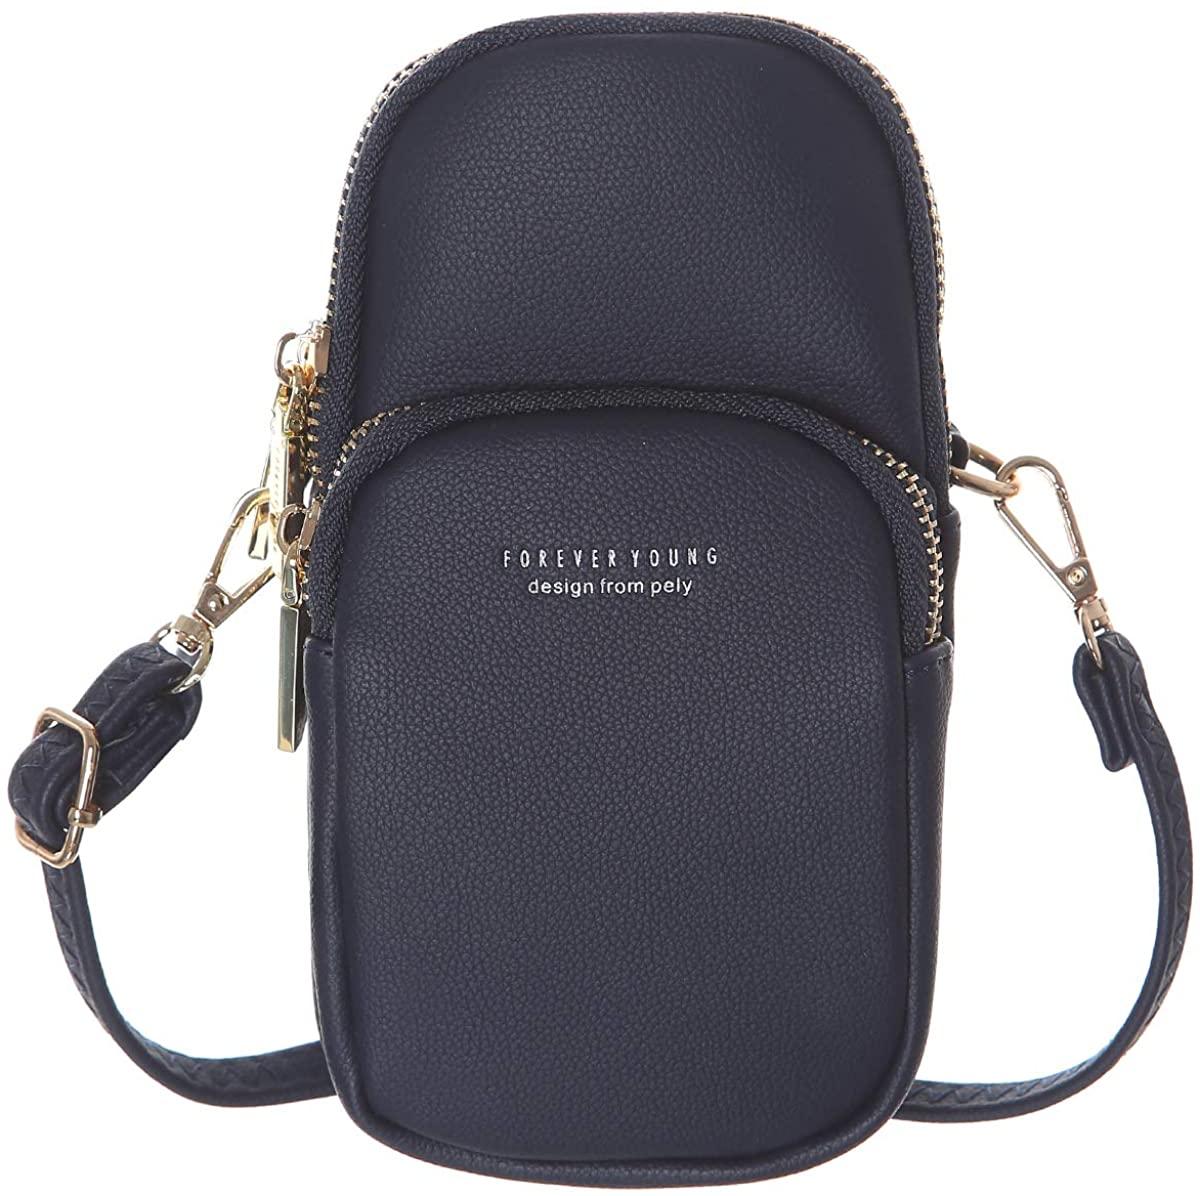 Mini Cell Phone Purses Pouch Wallet Haytijoe Small Crossbody Shoulder Bags For Women Girls